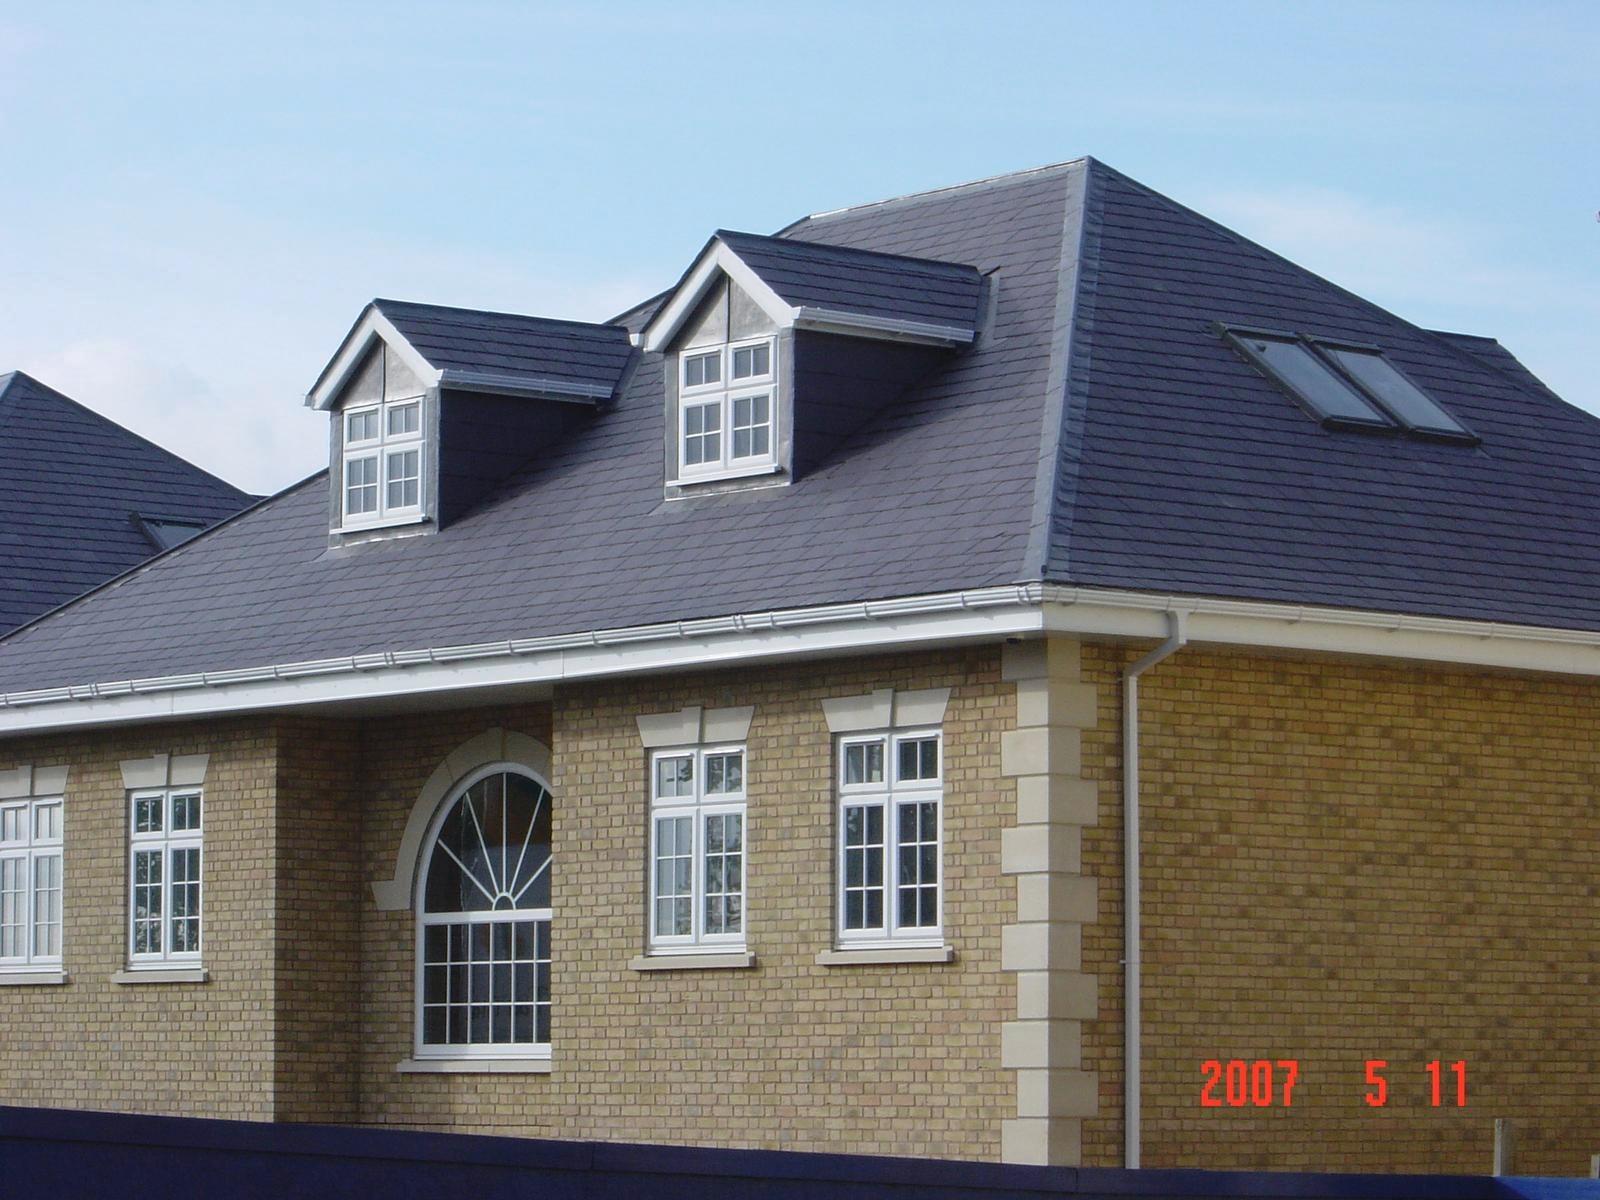 Oakland Roofing Ltd